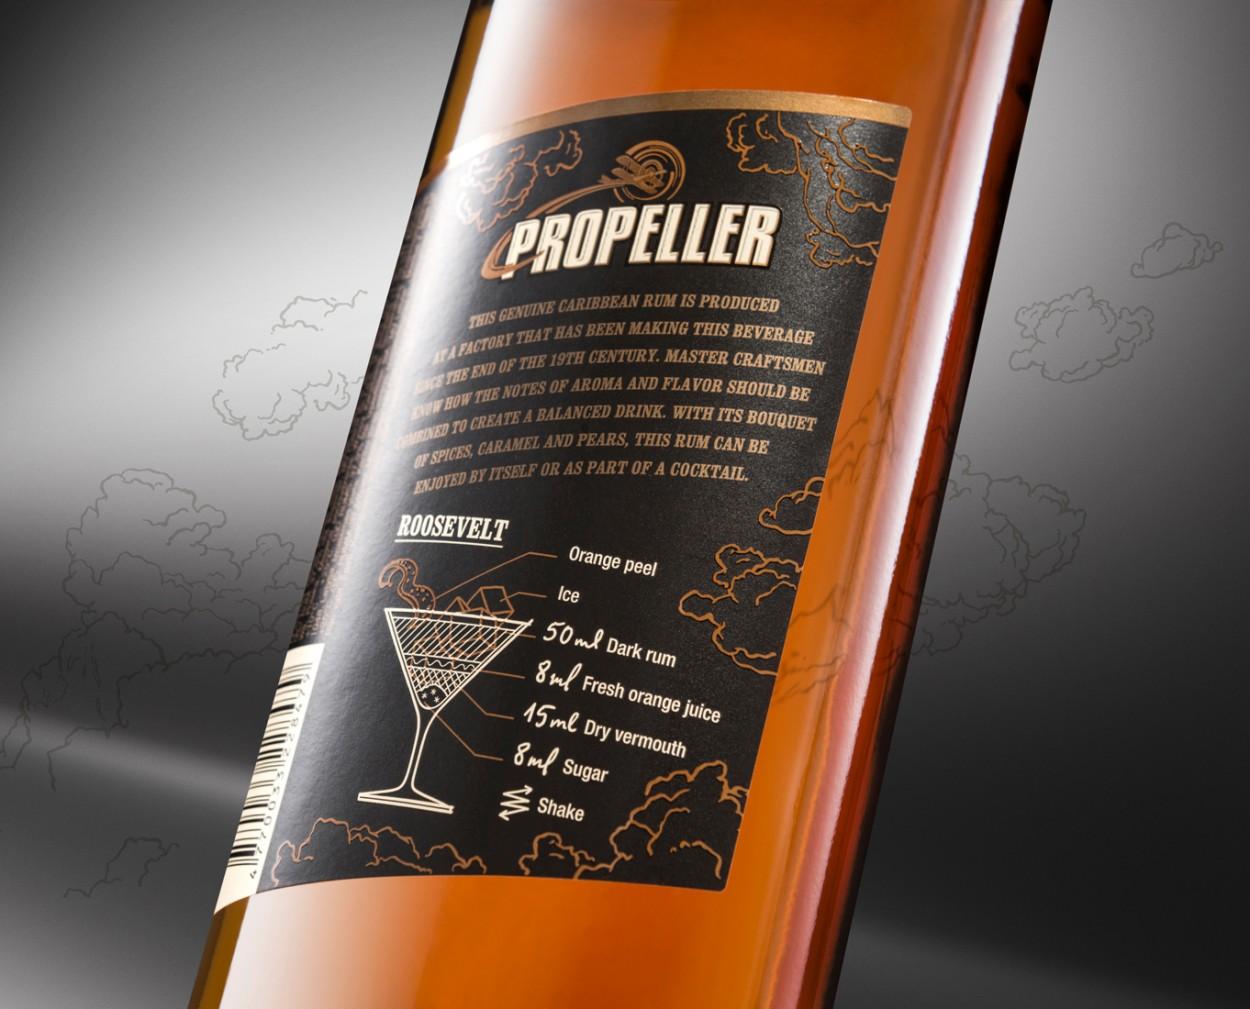 Propeller-5-Contra.jpg